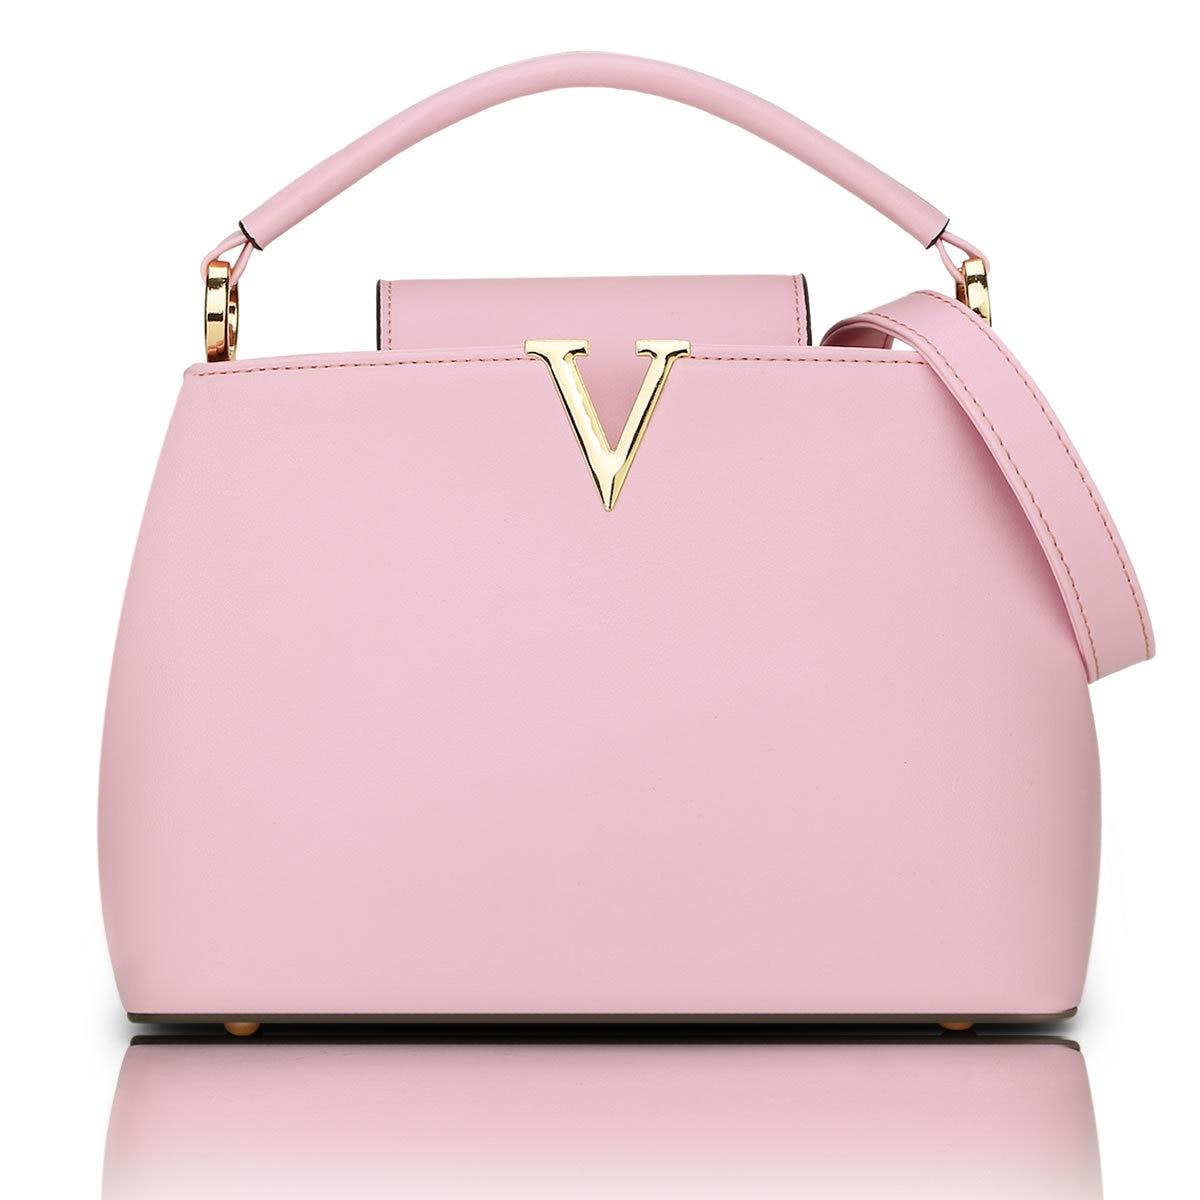 27c370ea3700 2017 The New women fashionable Brand Handbag Shoulder PU leather ...